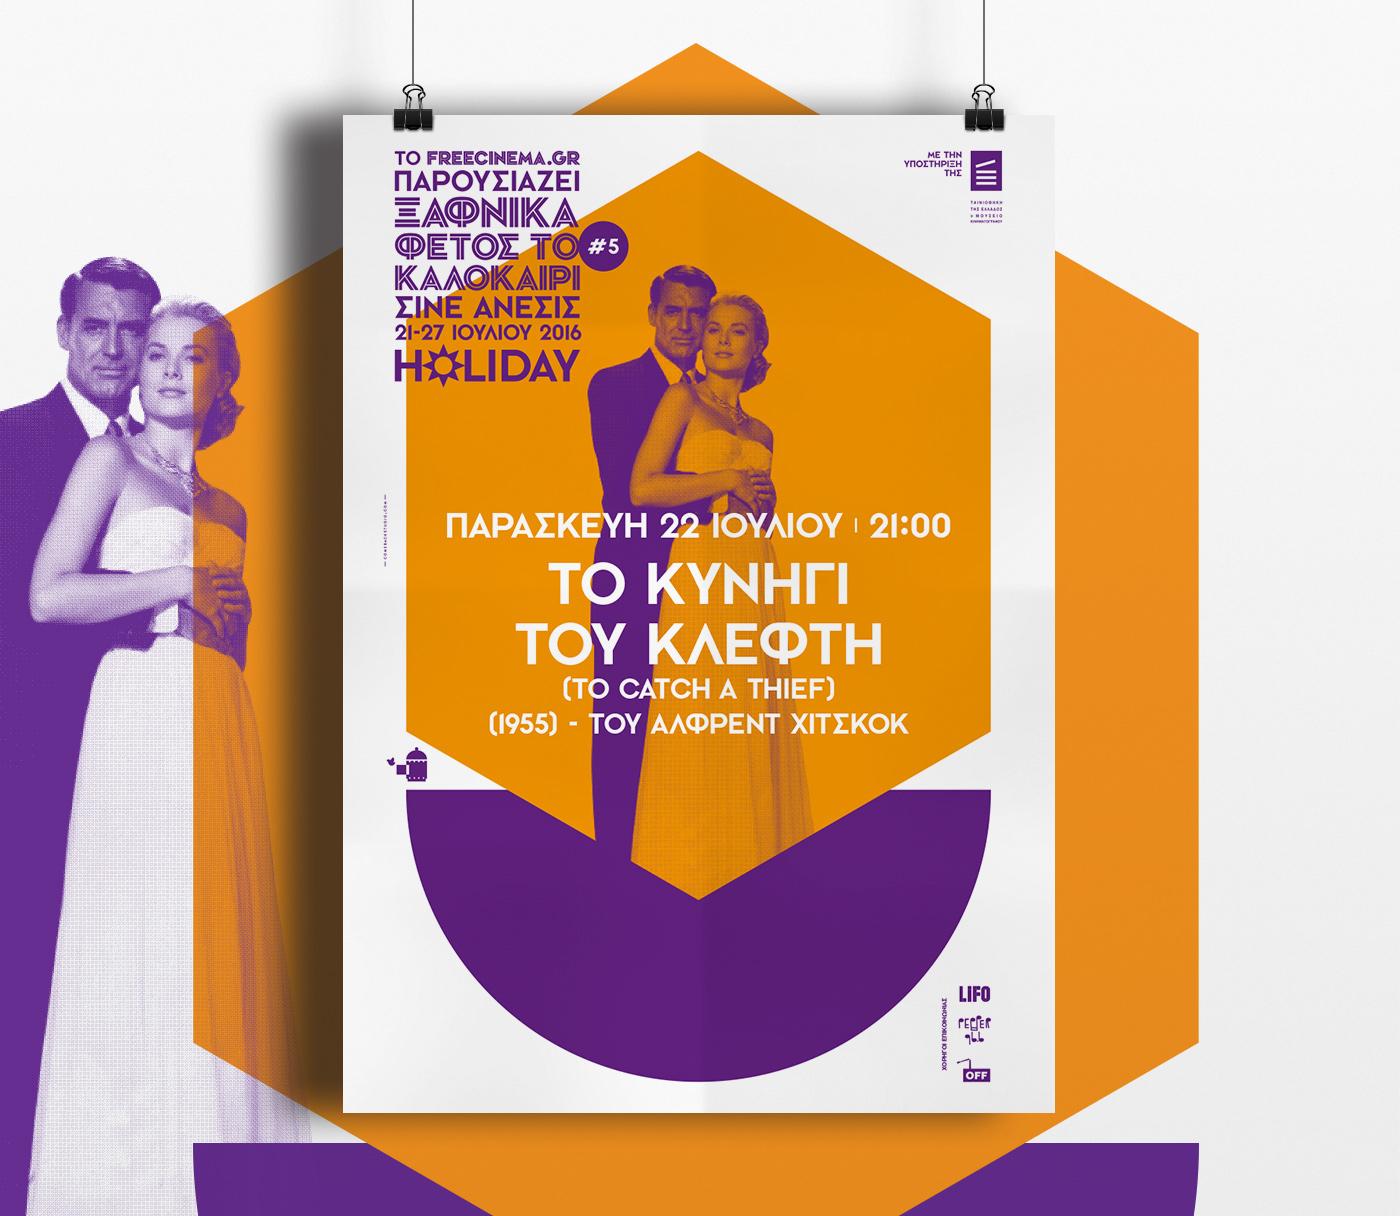 film posters poster Greece freecinema Cinema Movie Posters film tribute Summer Festival film festival